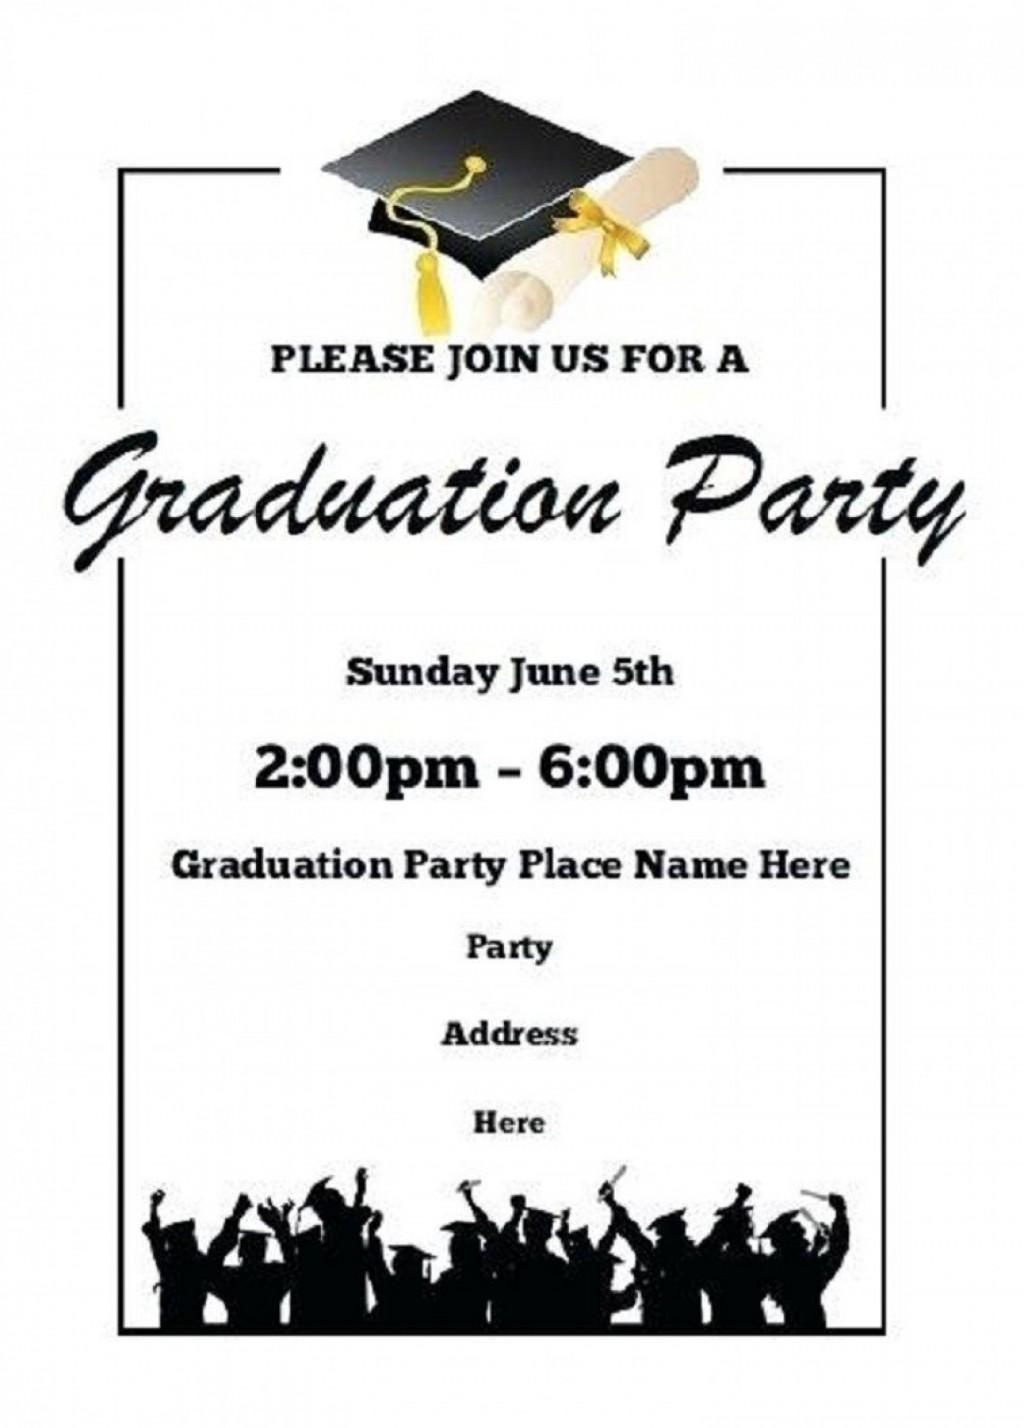 002 Wondrou Graduation Party Invitation Template Sample  Templates 4 Per Page Free ReceptionLarge